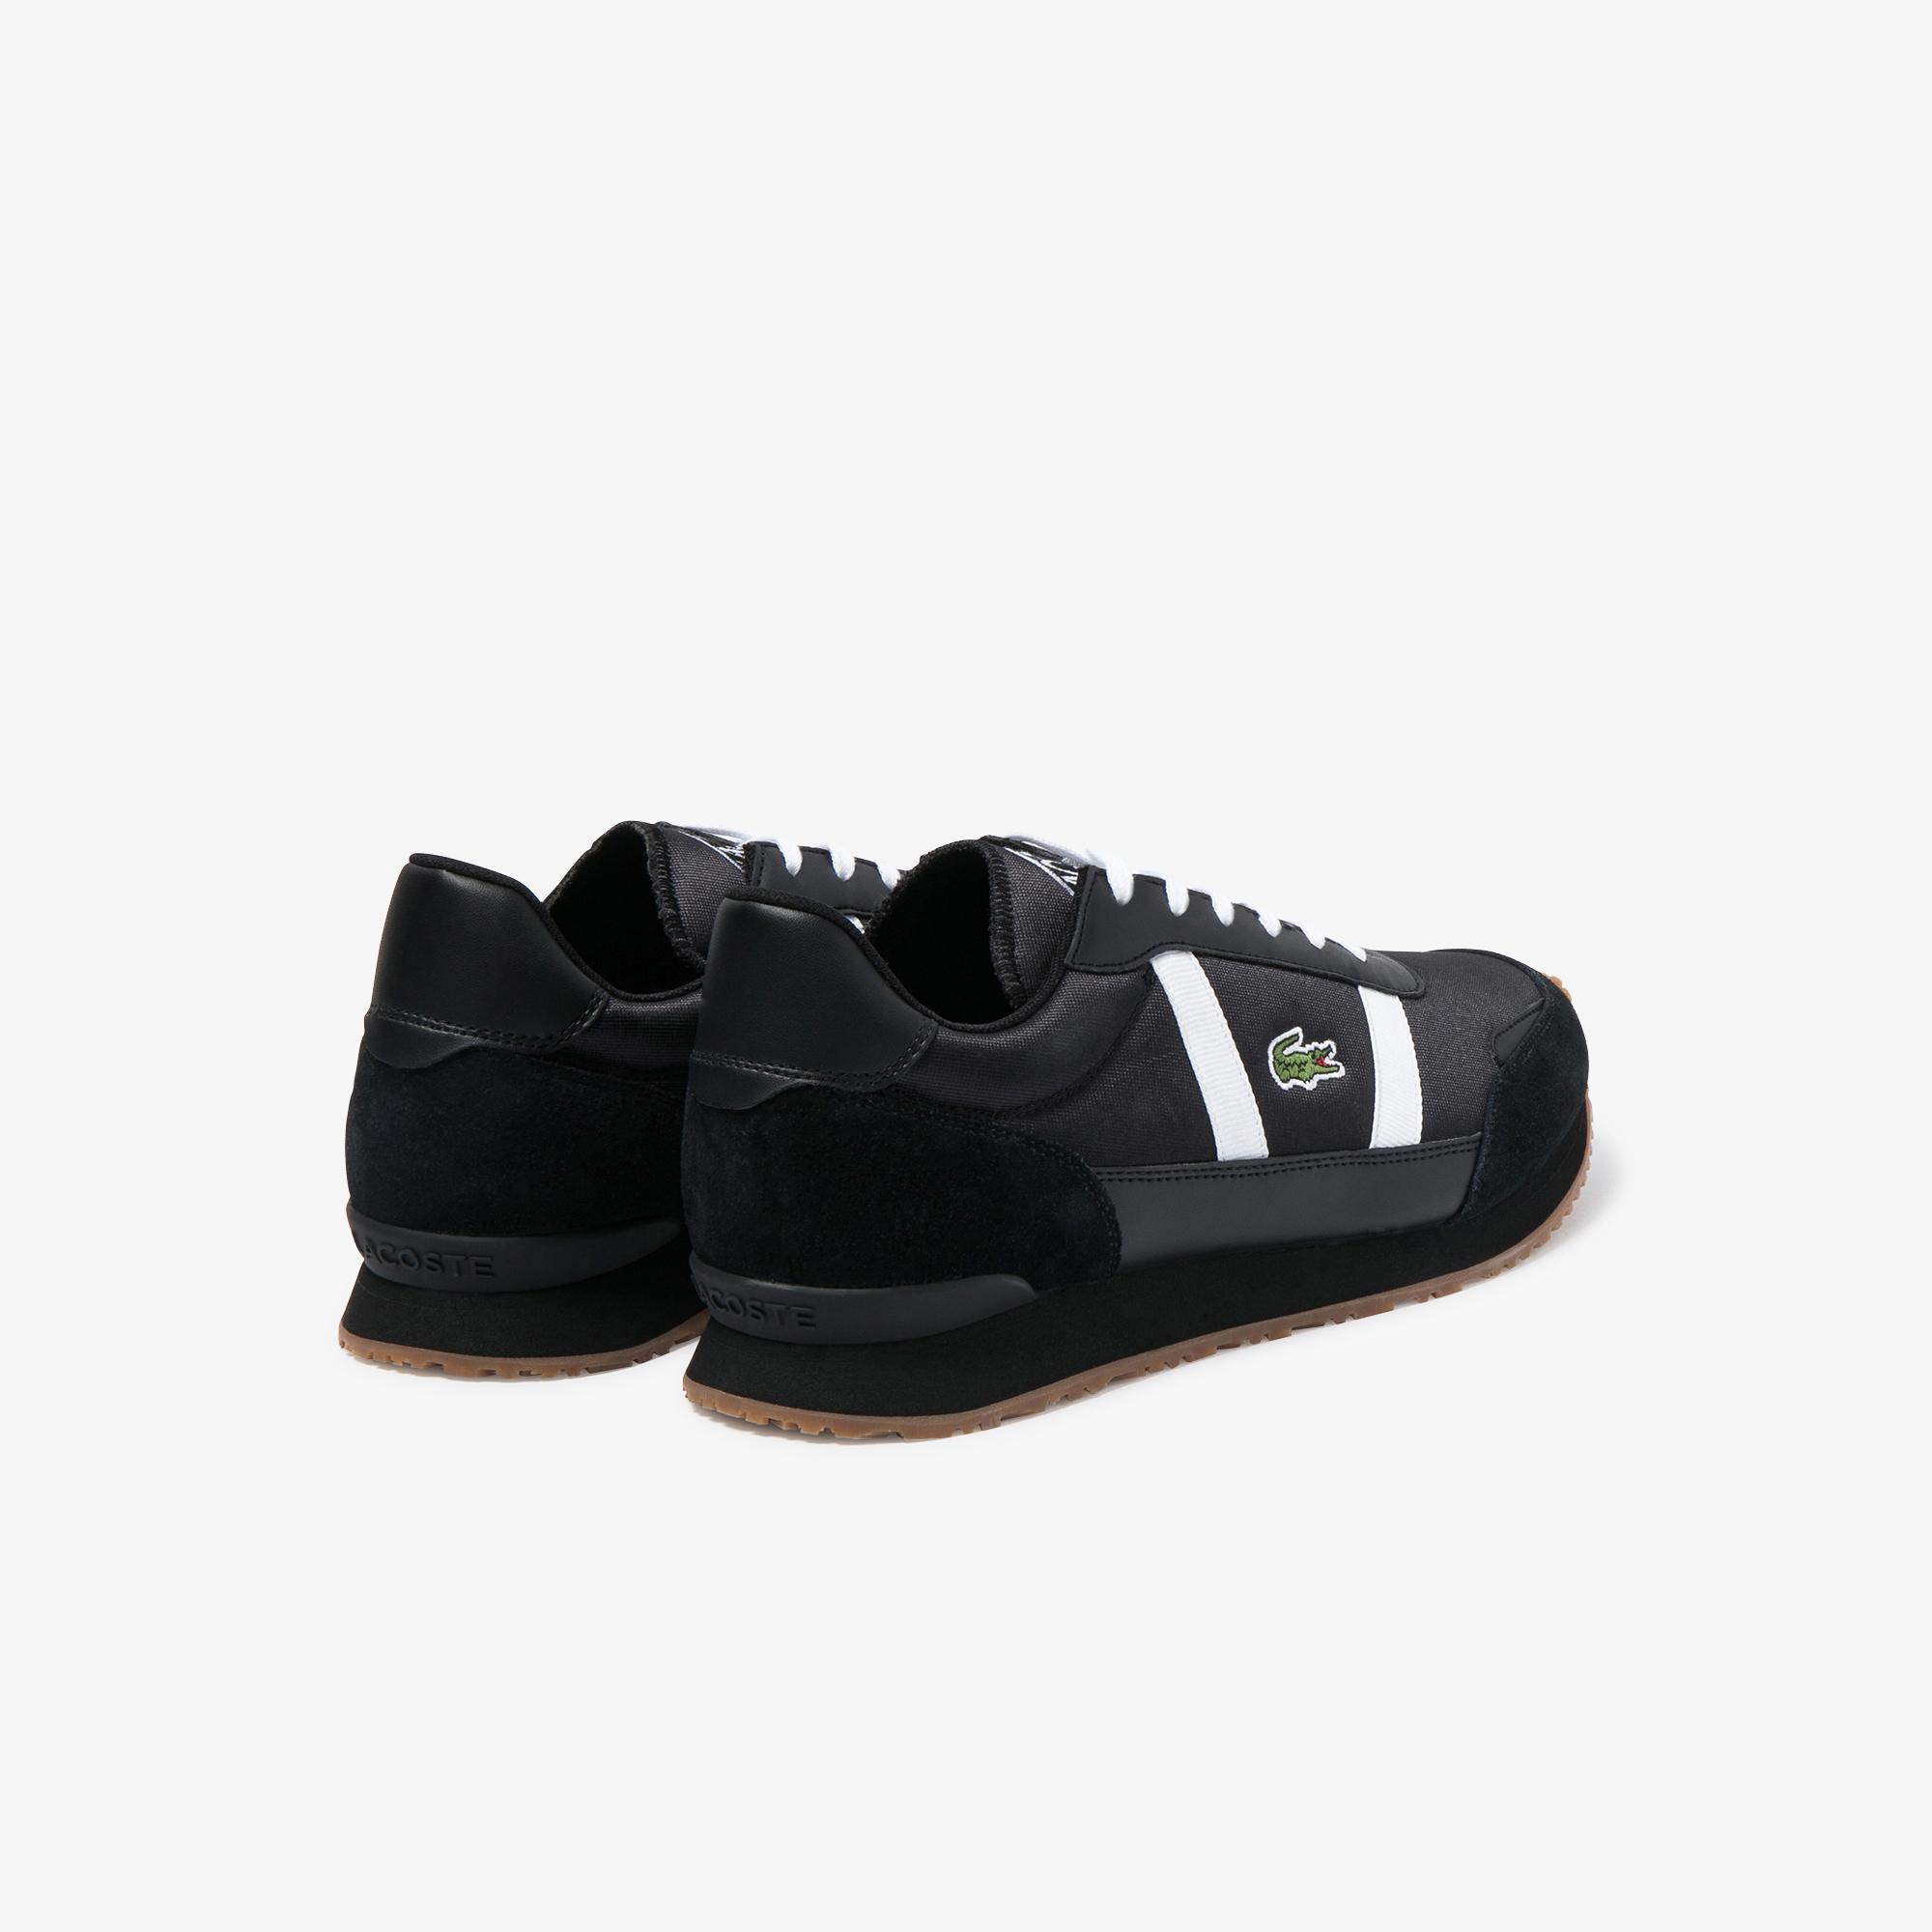 Lacoste Partner 120 4 Sma Erkek Siyah - Gri Sneaker